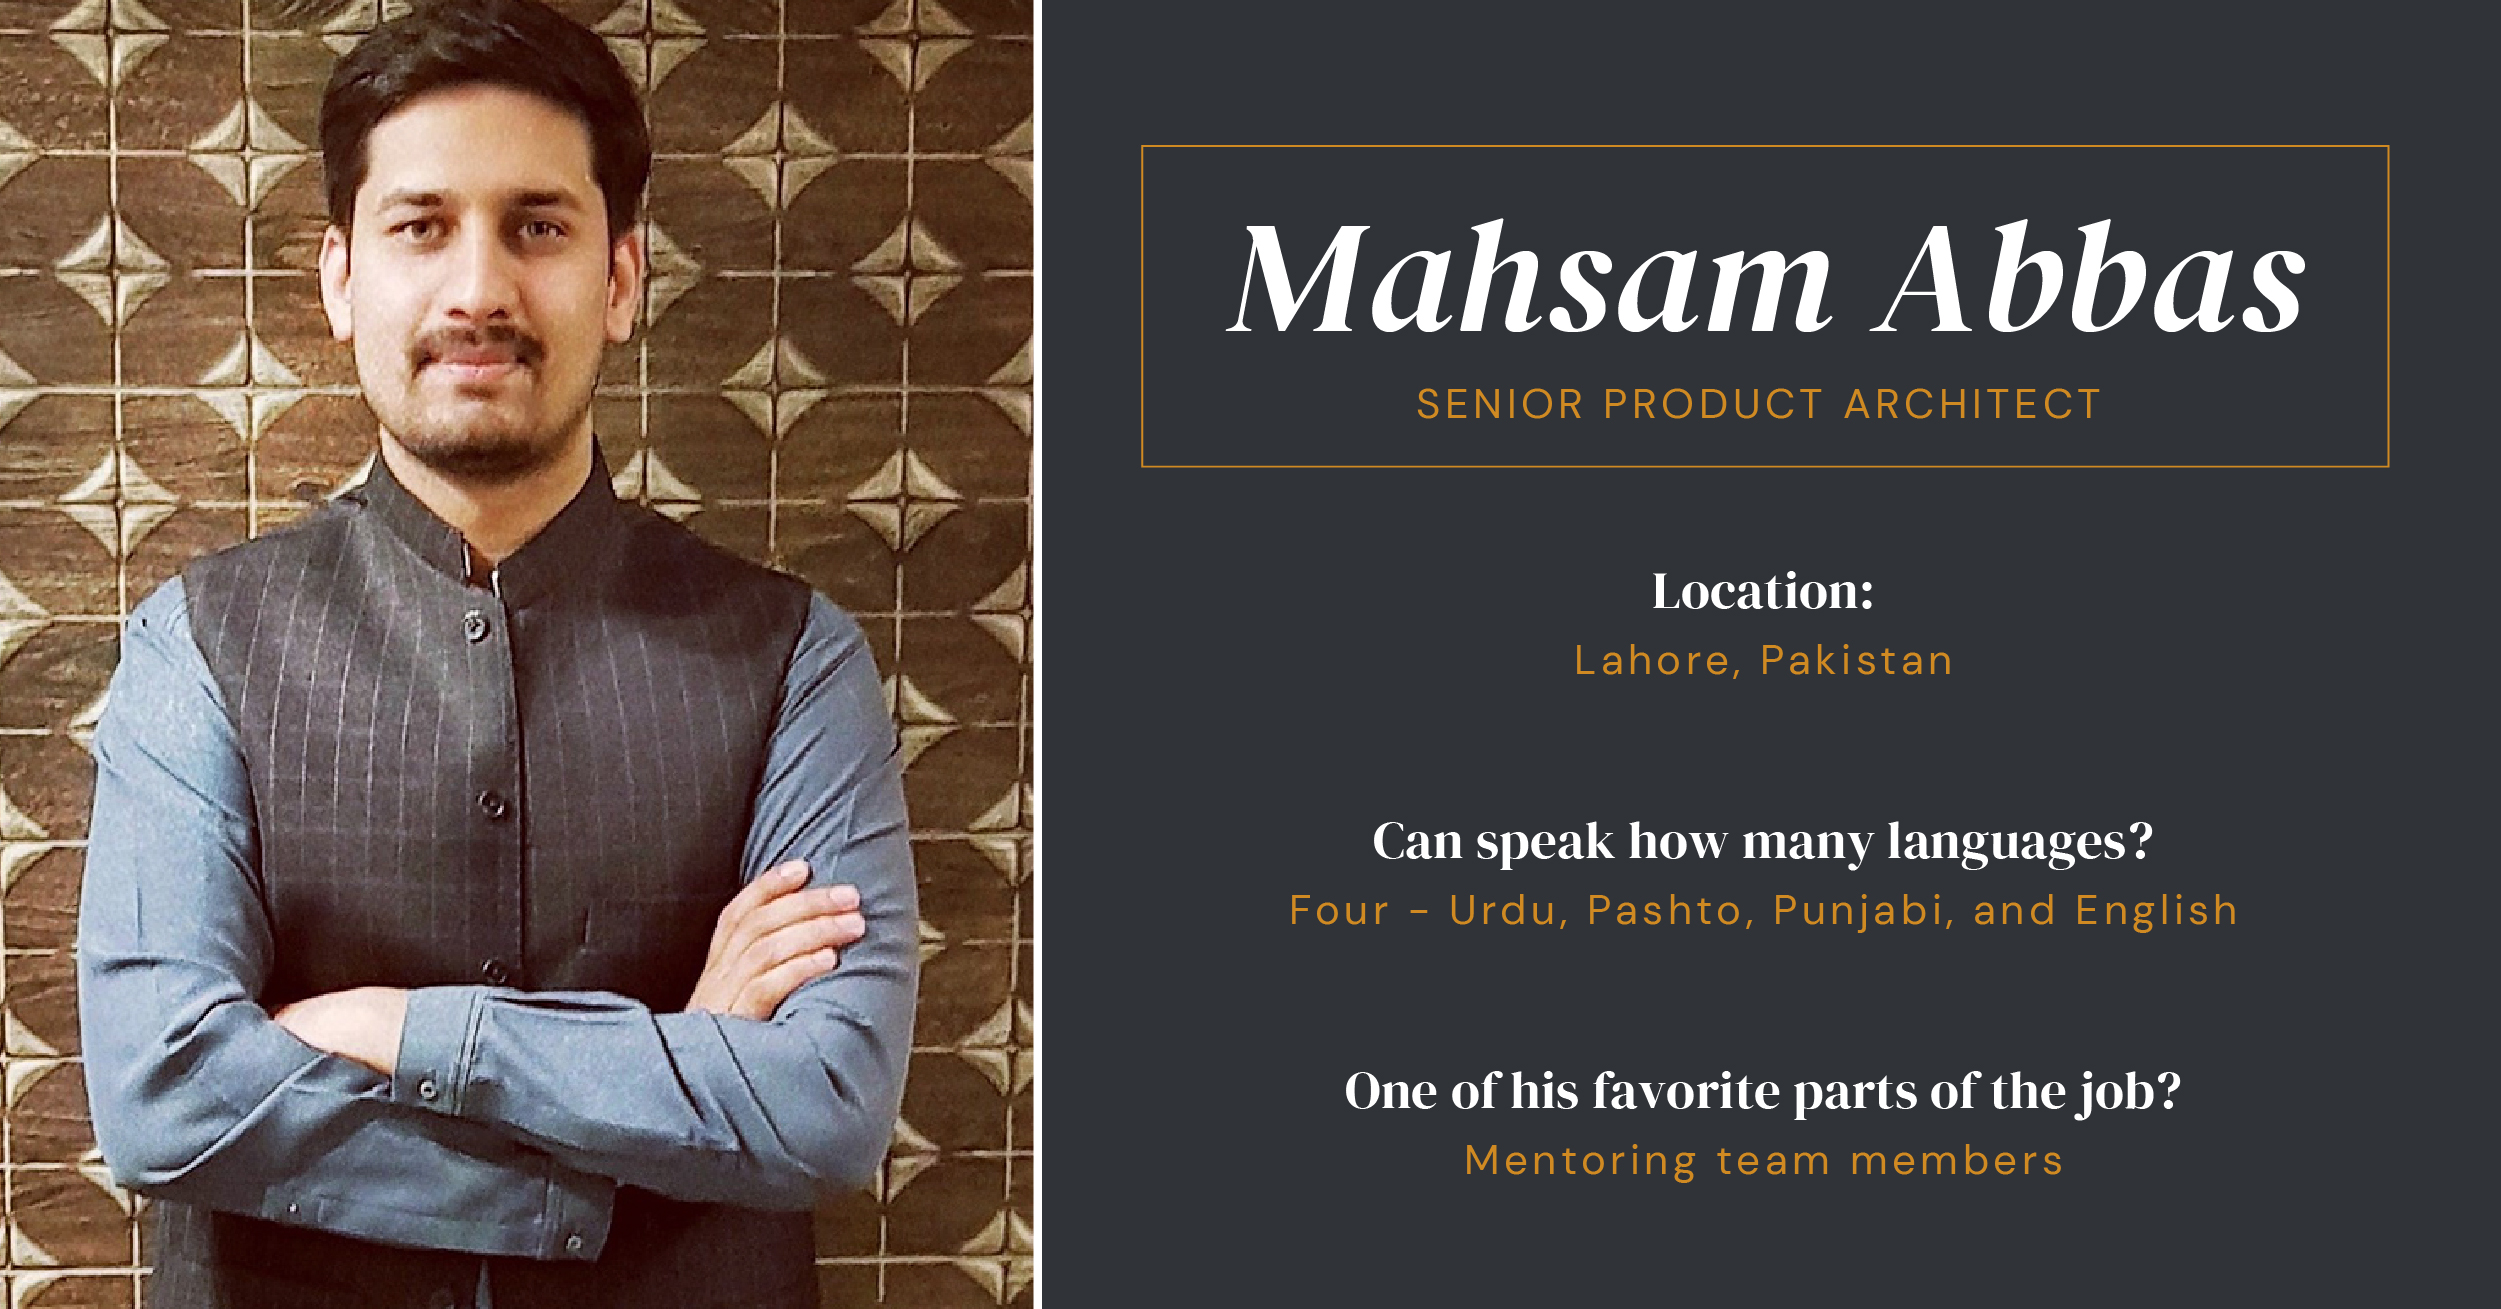 Senior Product Architect Mahsam Abbas